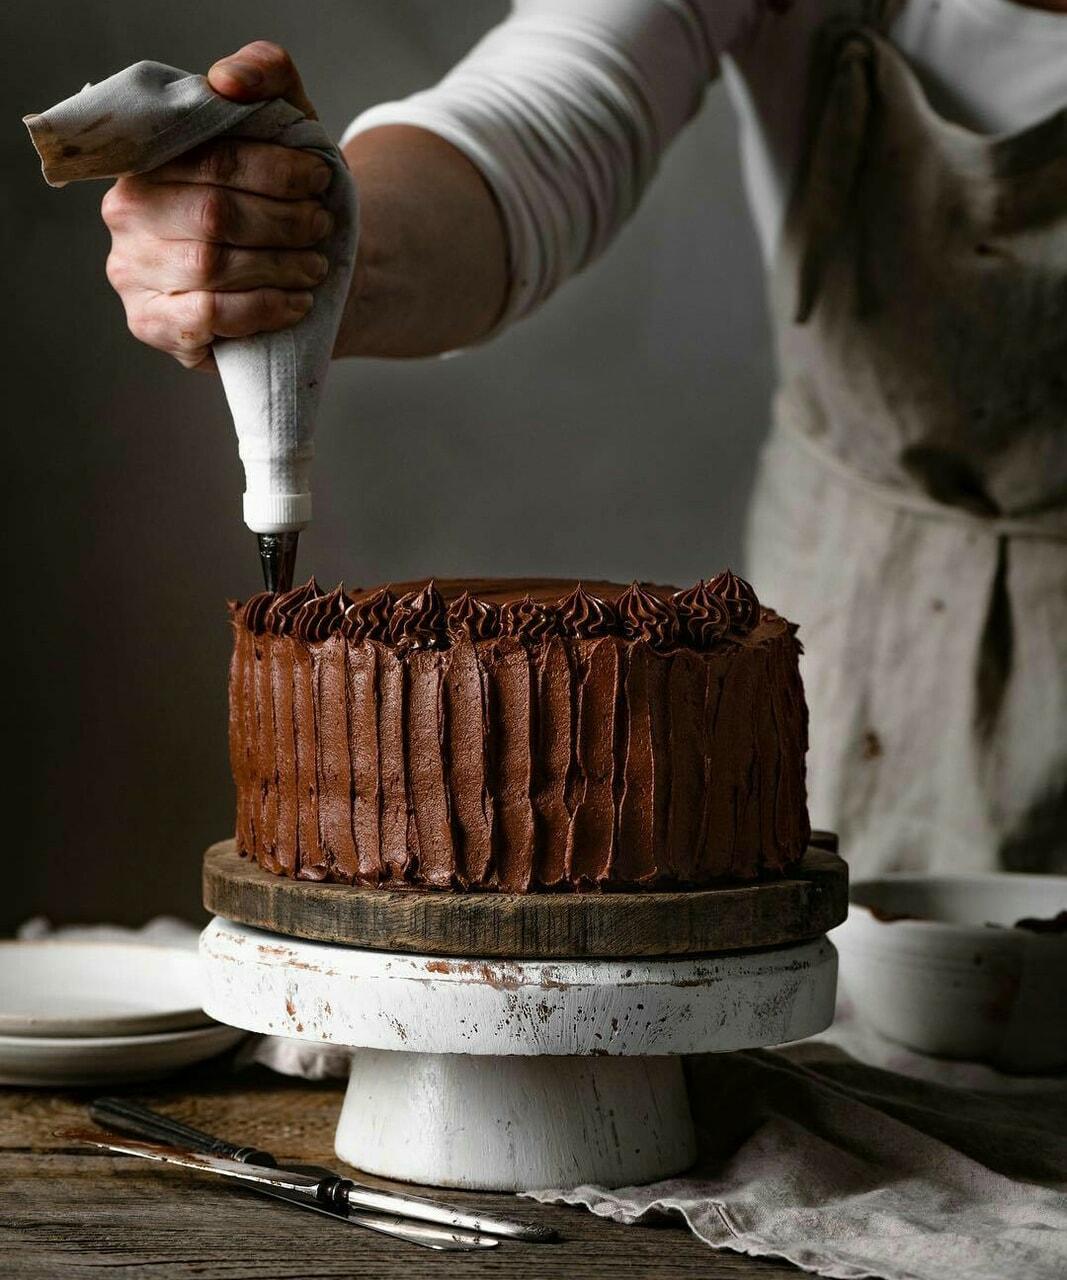 chocolate cake icing image